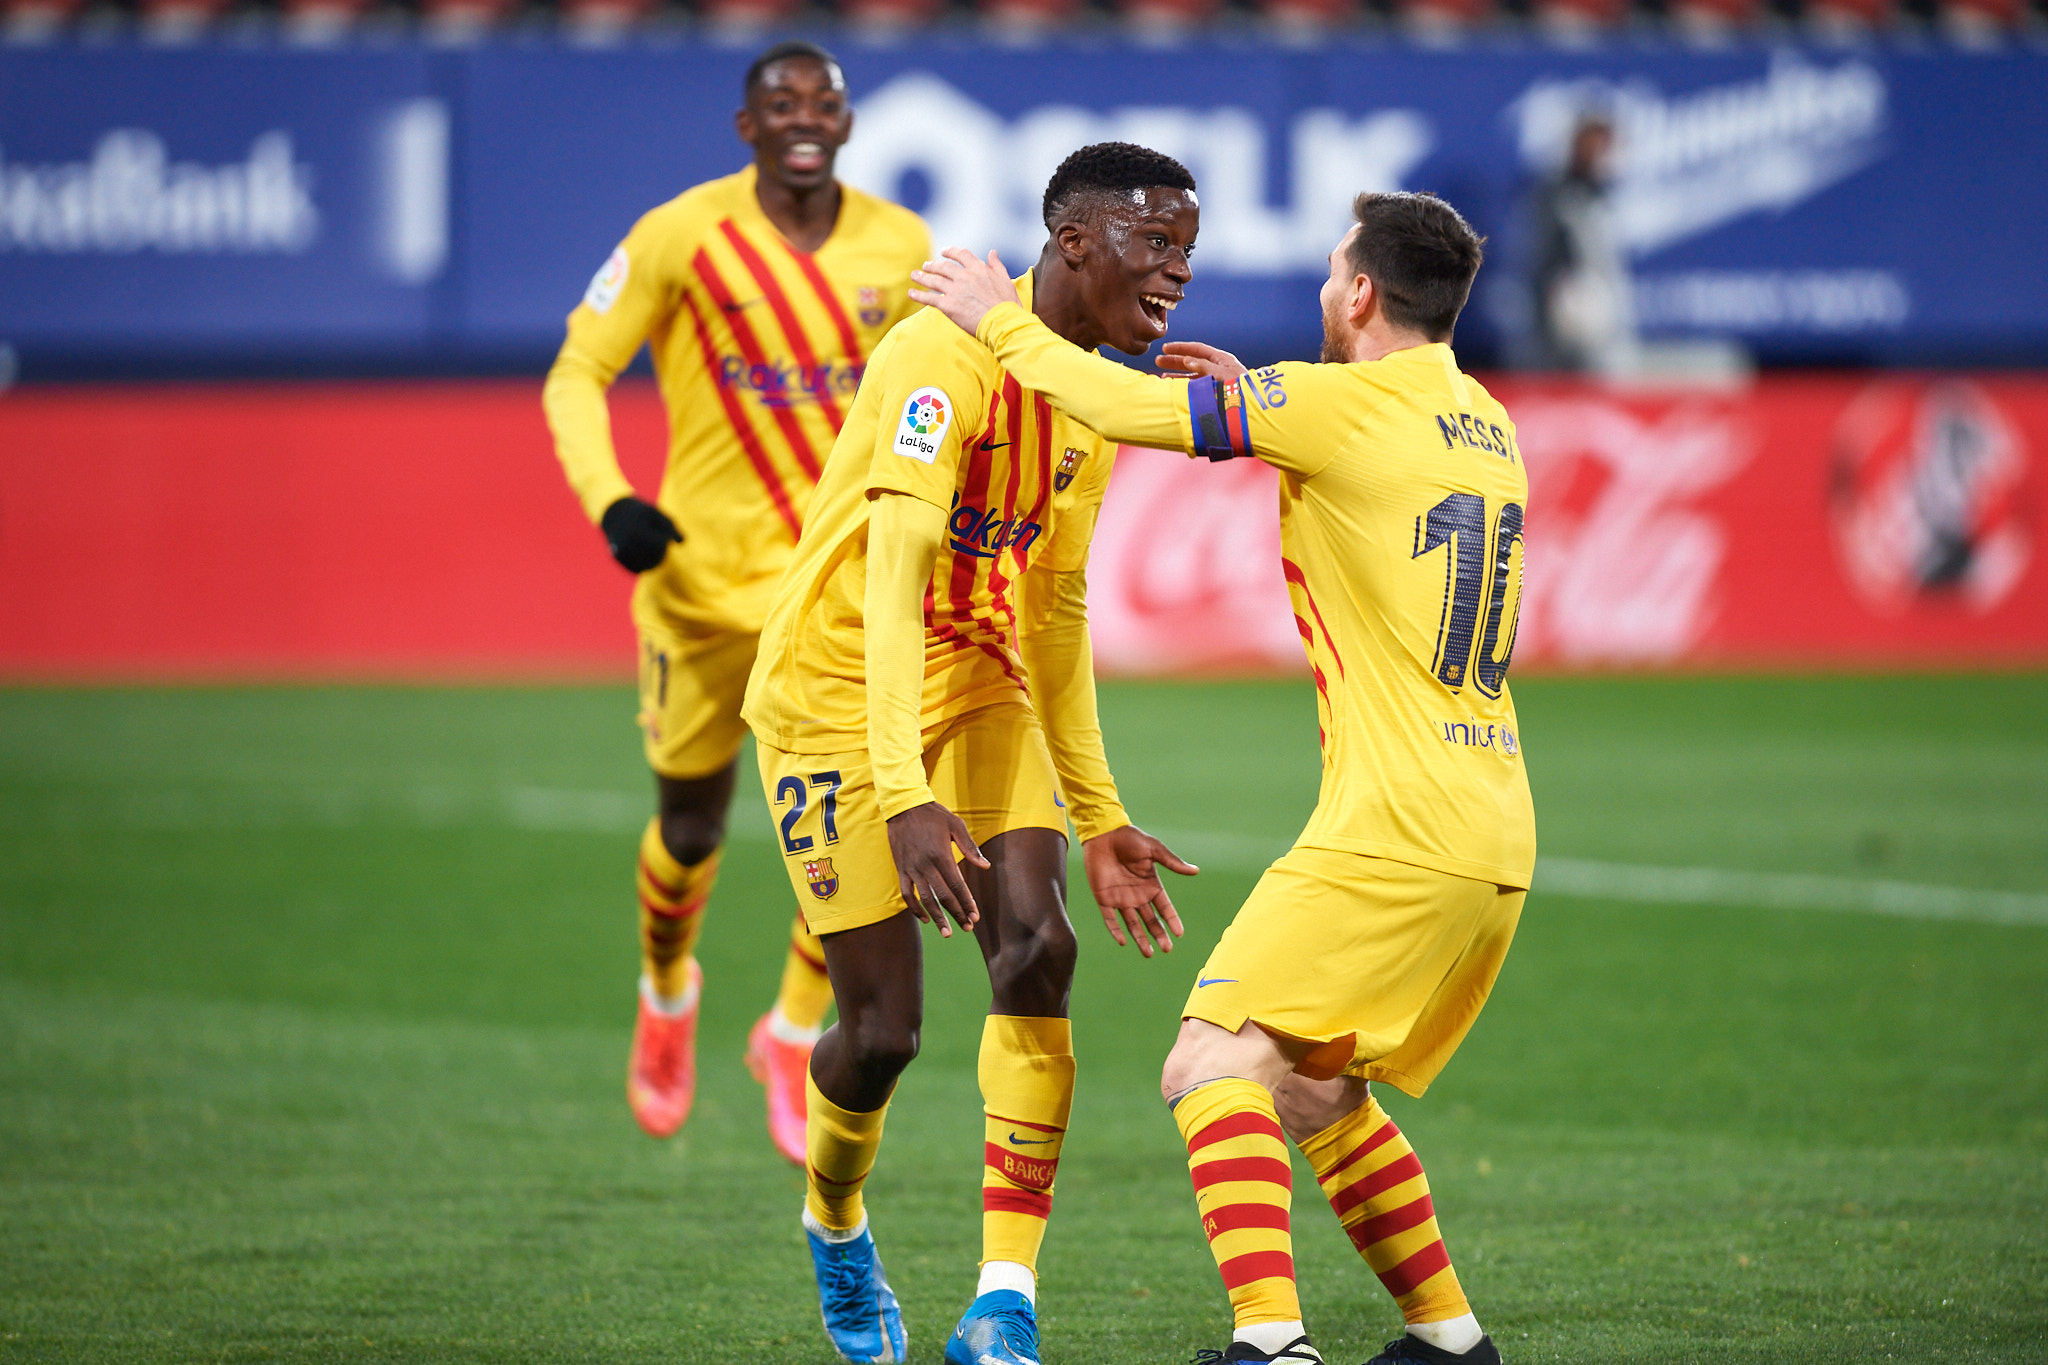 Ilaix Moriba (FC <a href='/clubs/barcelona'>Barcelona</a>) 3.jpg